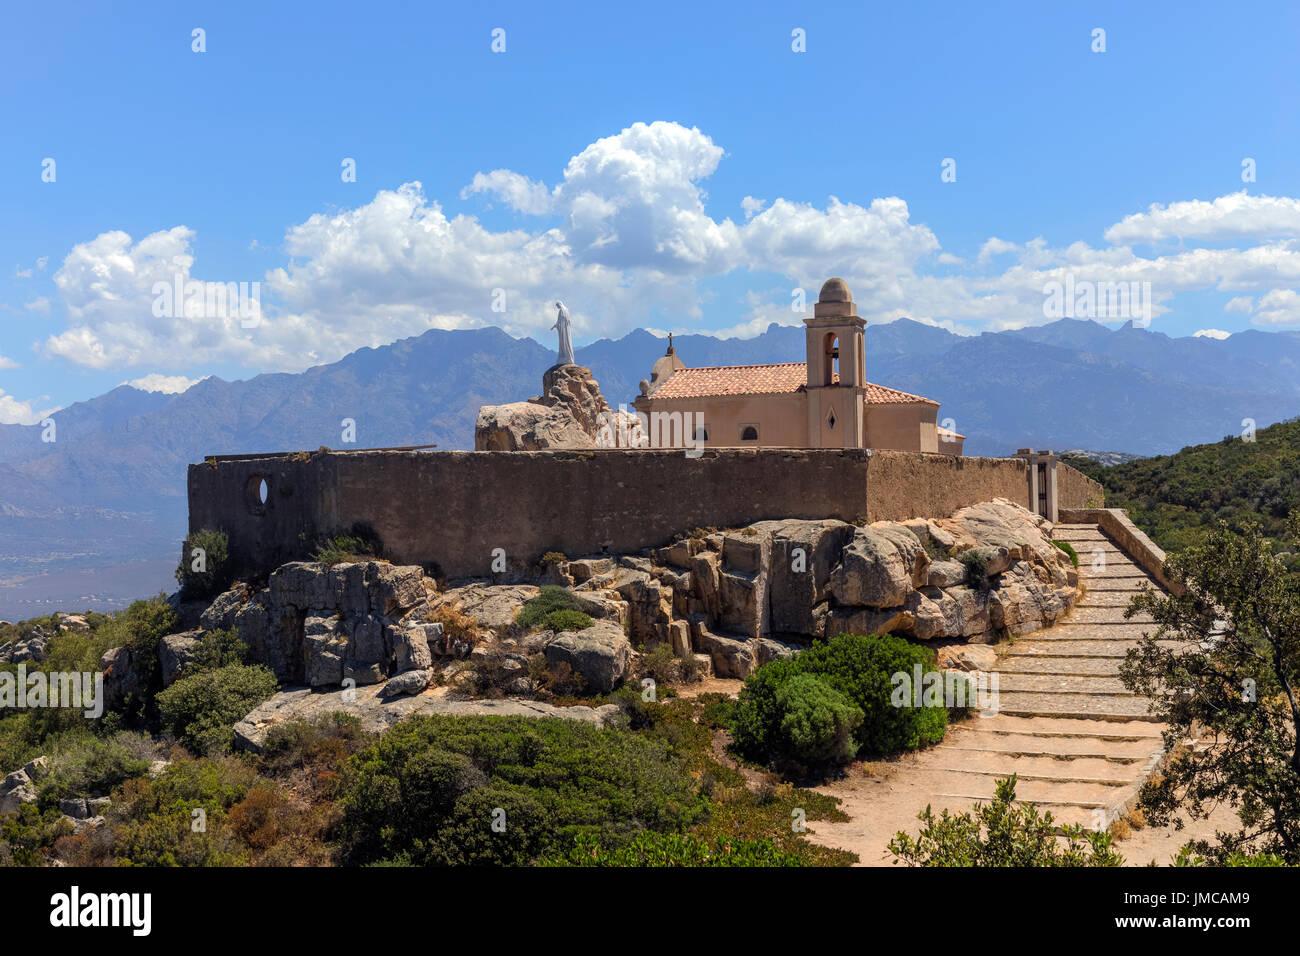 Notre Dame de la Serra, Calvi, Corsica, France - Stock Image